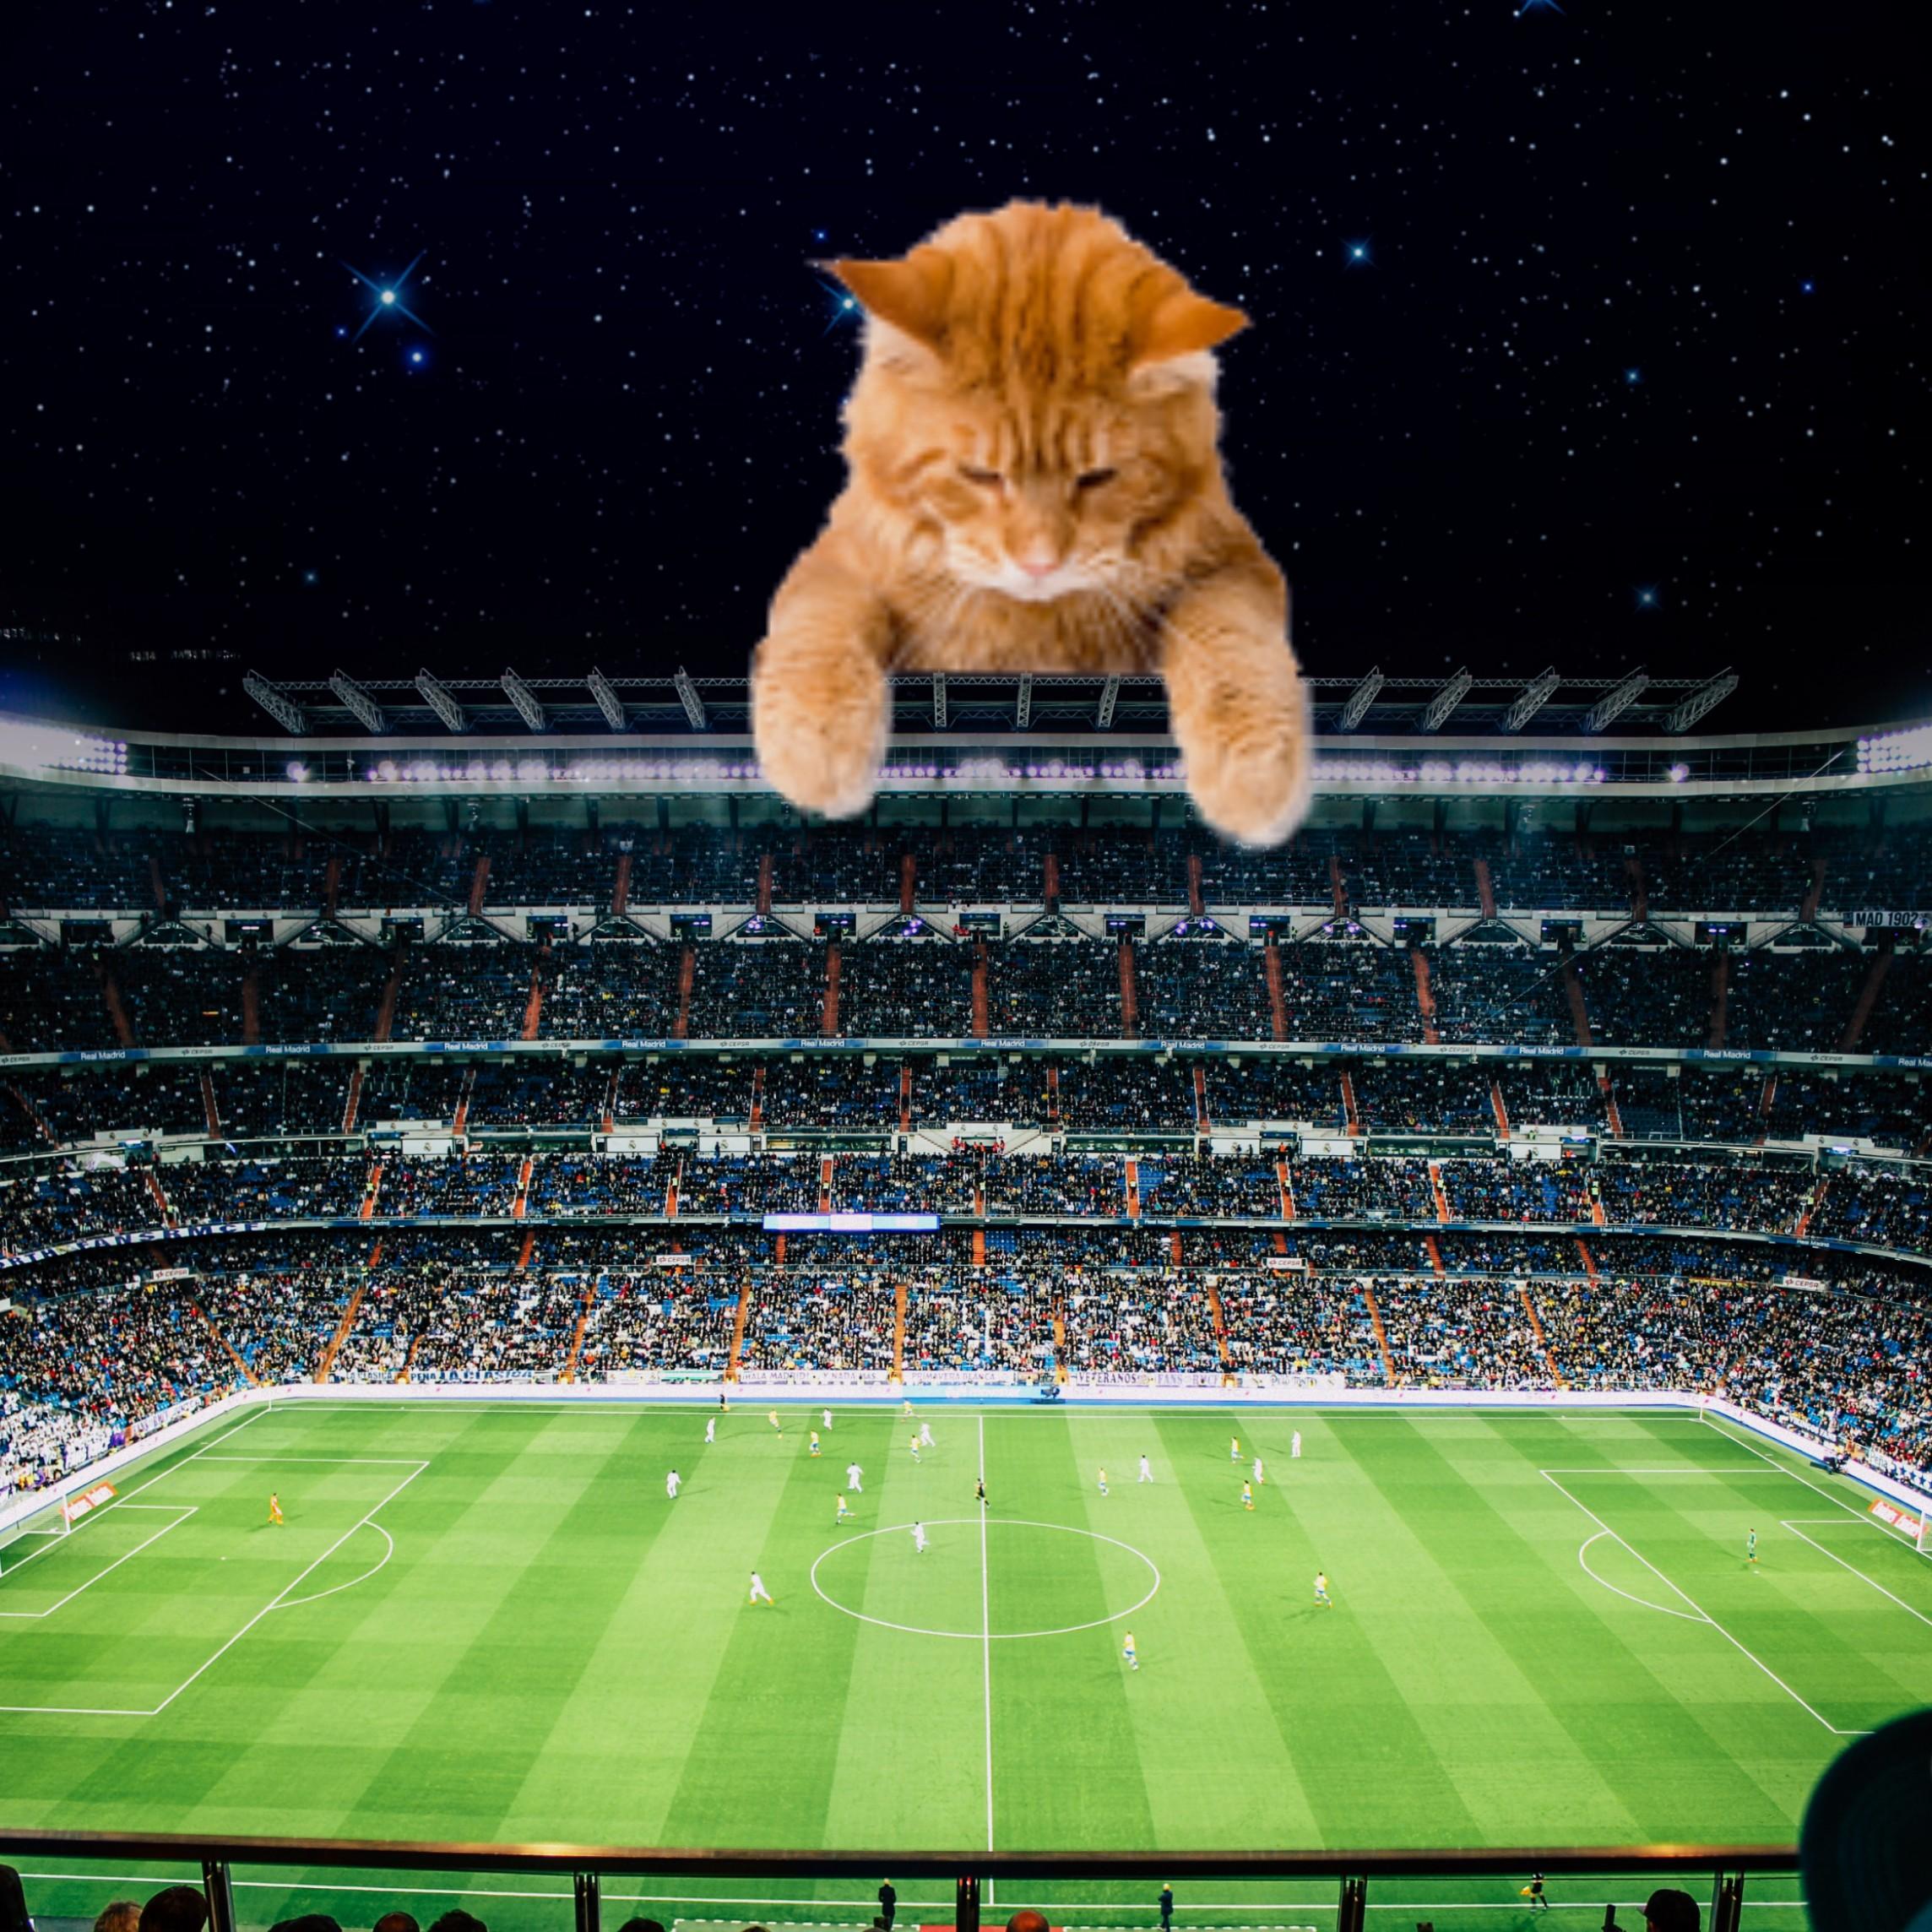 #freetoedit #giantanimals #cat #stadium #football